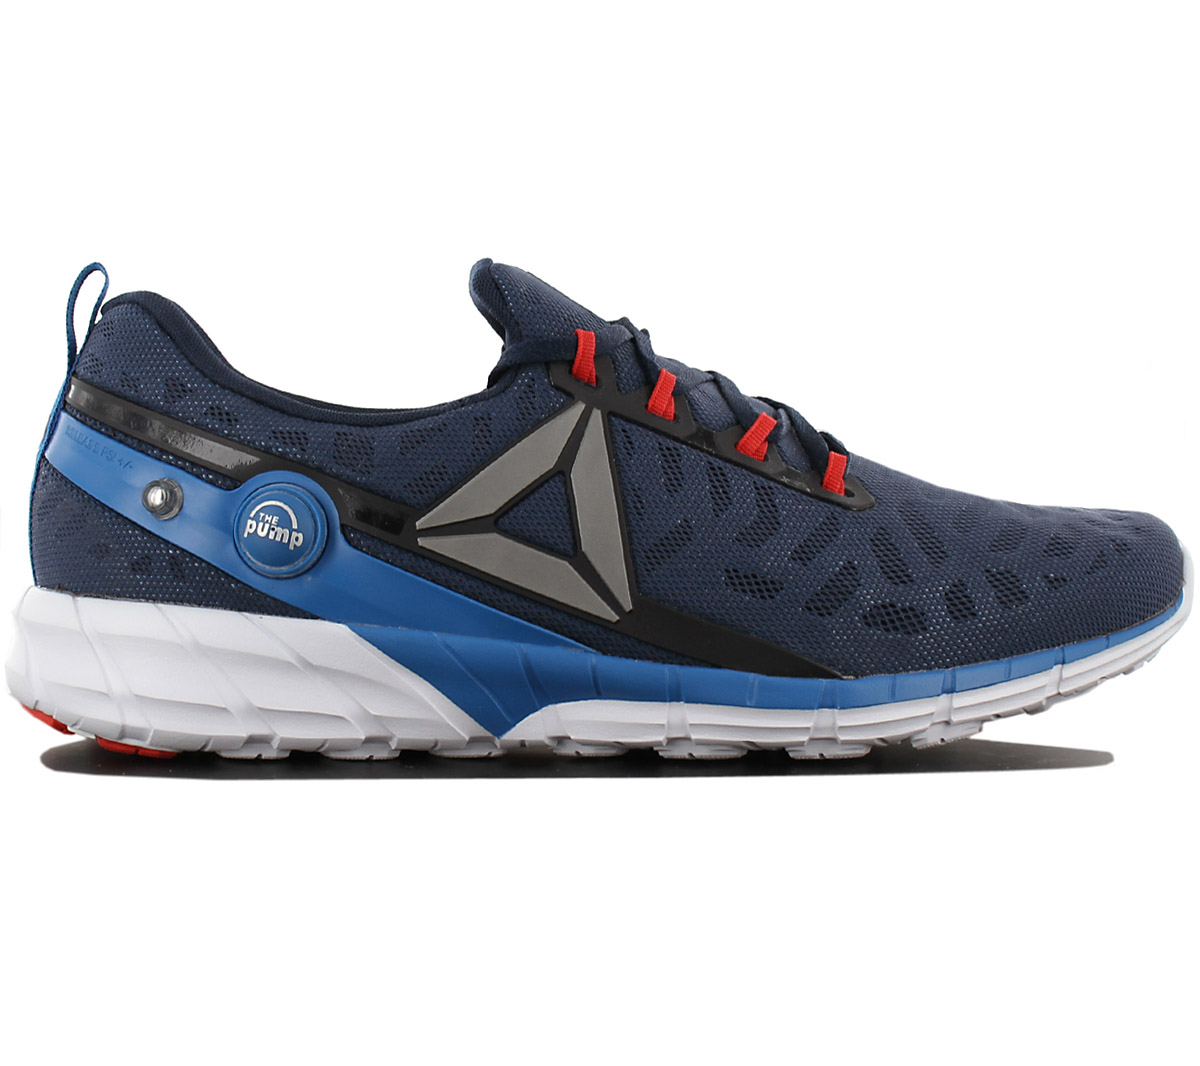 Reebok Zpump Fusion 2.5 Pump Men s Shoes Sneakers Running Sports ... 9bd41af35